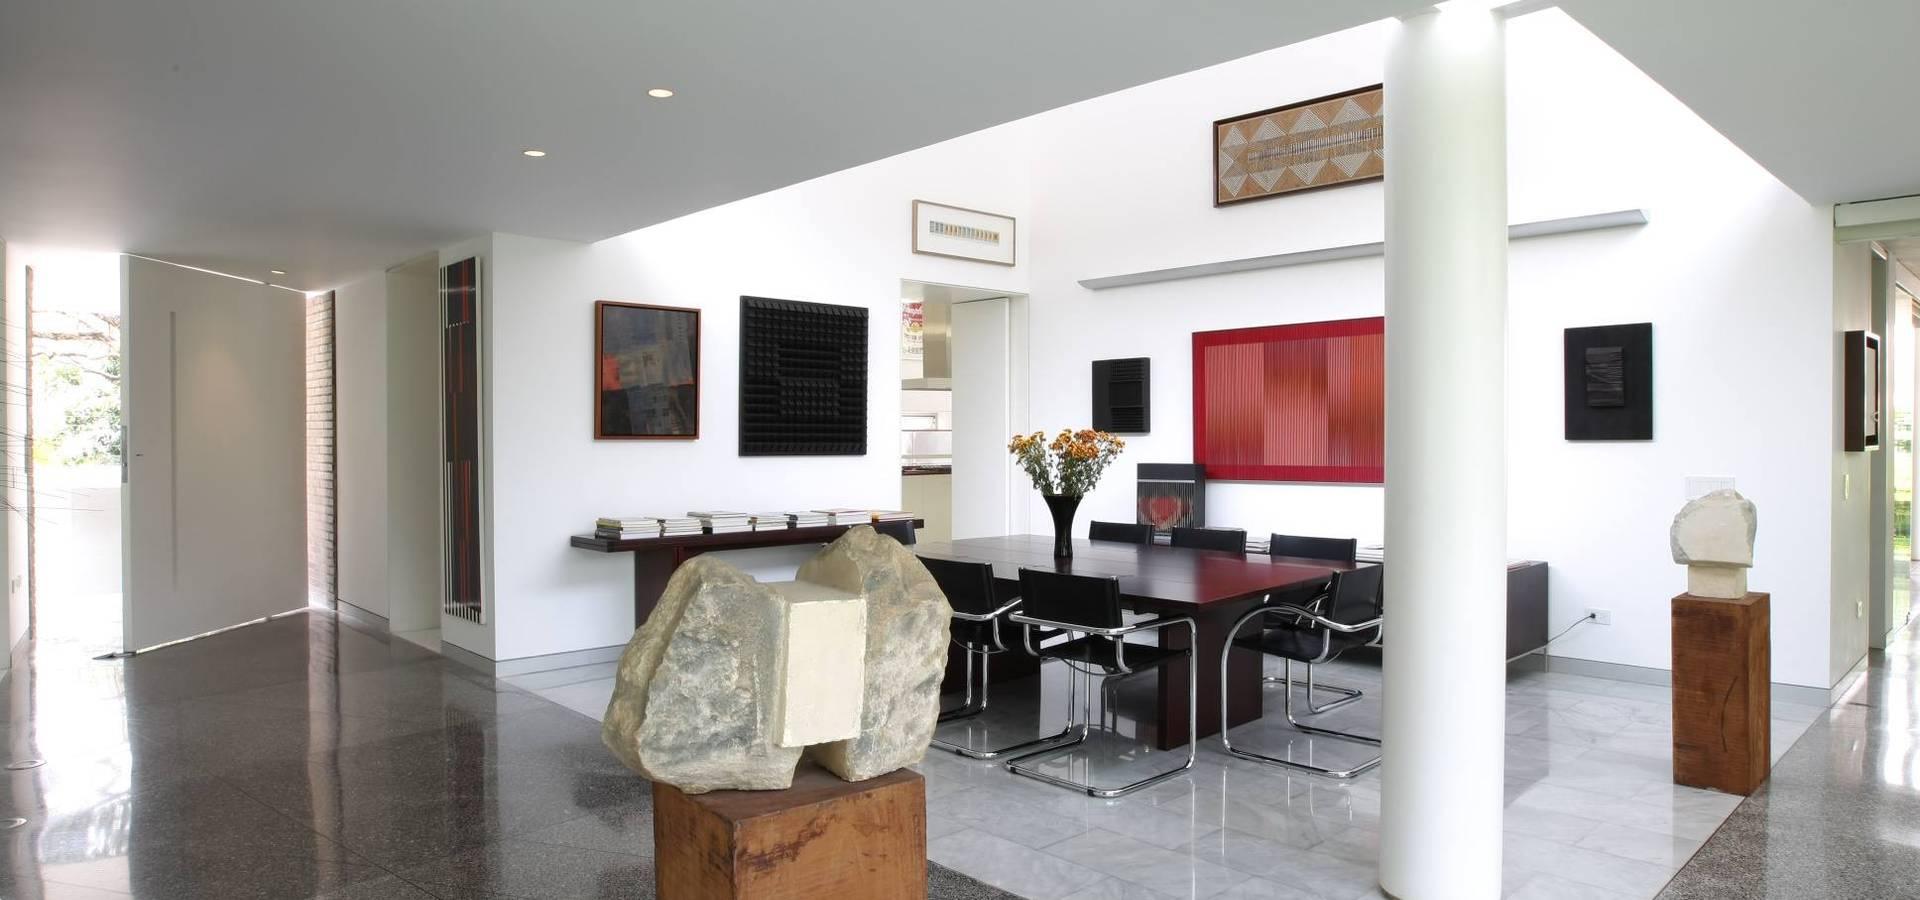 Casa ag by oda oficina de arquitectura homify for Arquitectura de oficinas